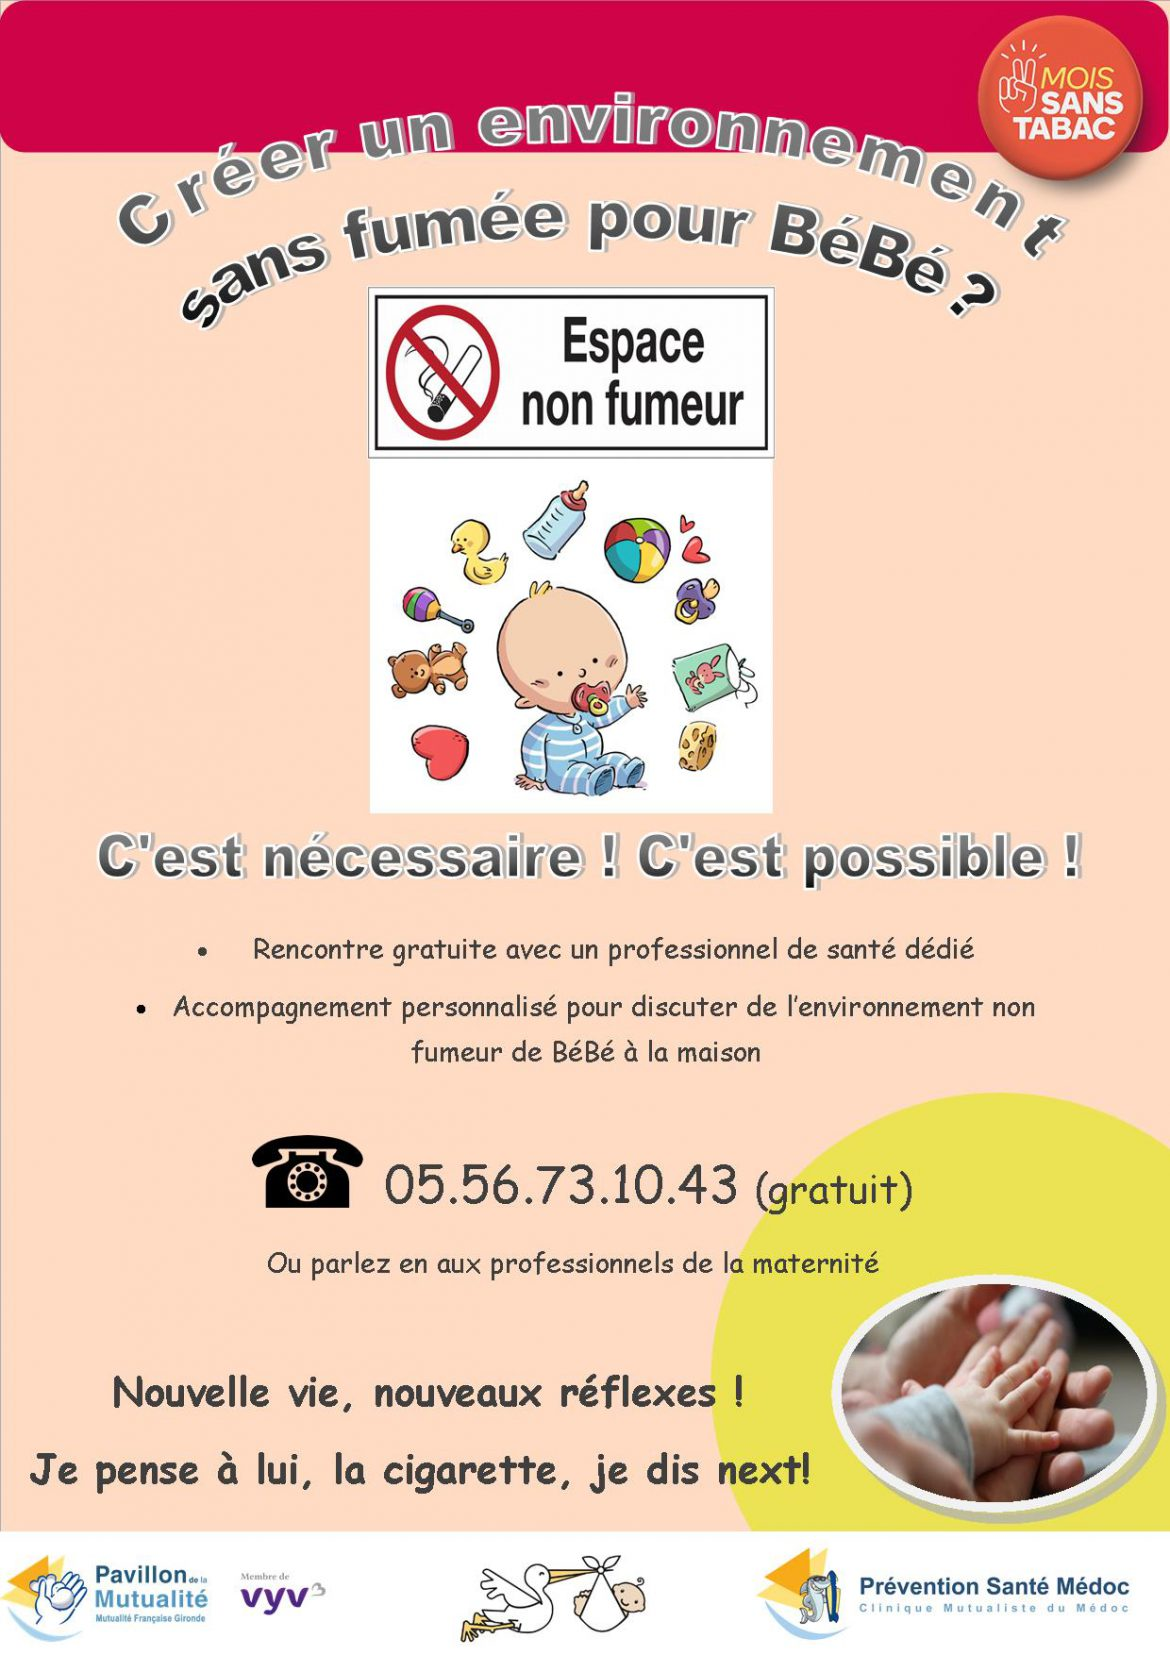 mois-ss-tabac-maternité.jpg